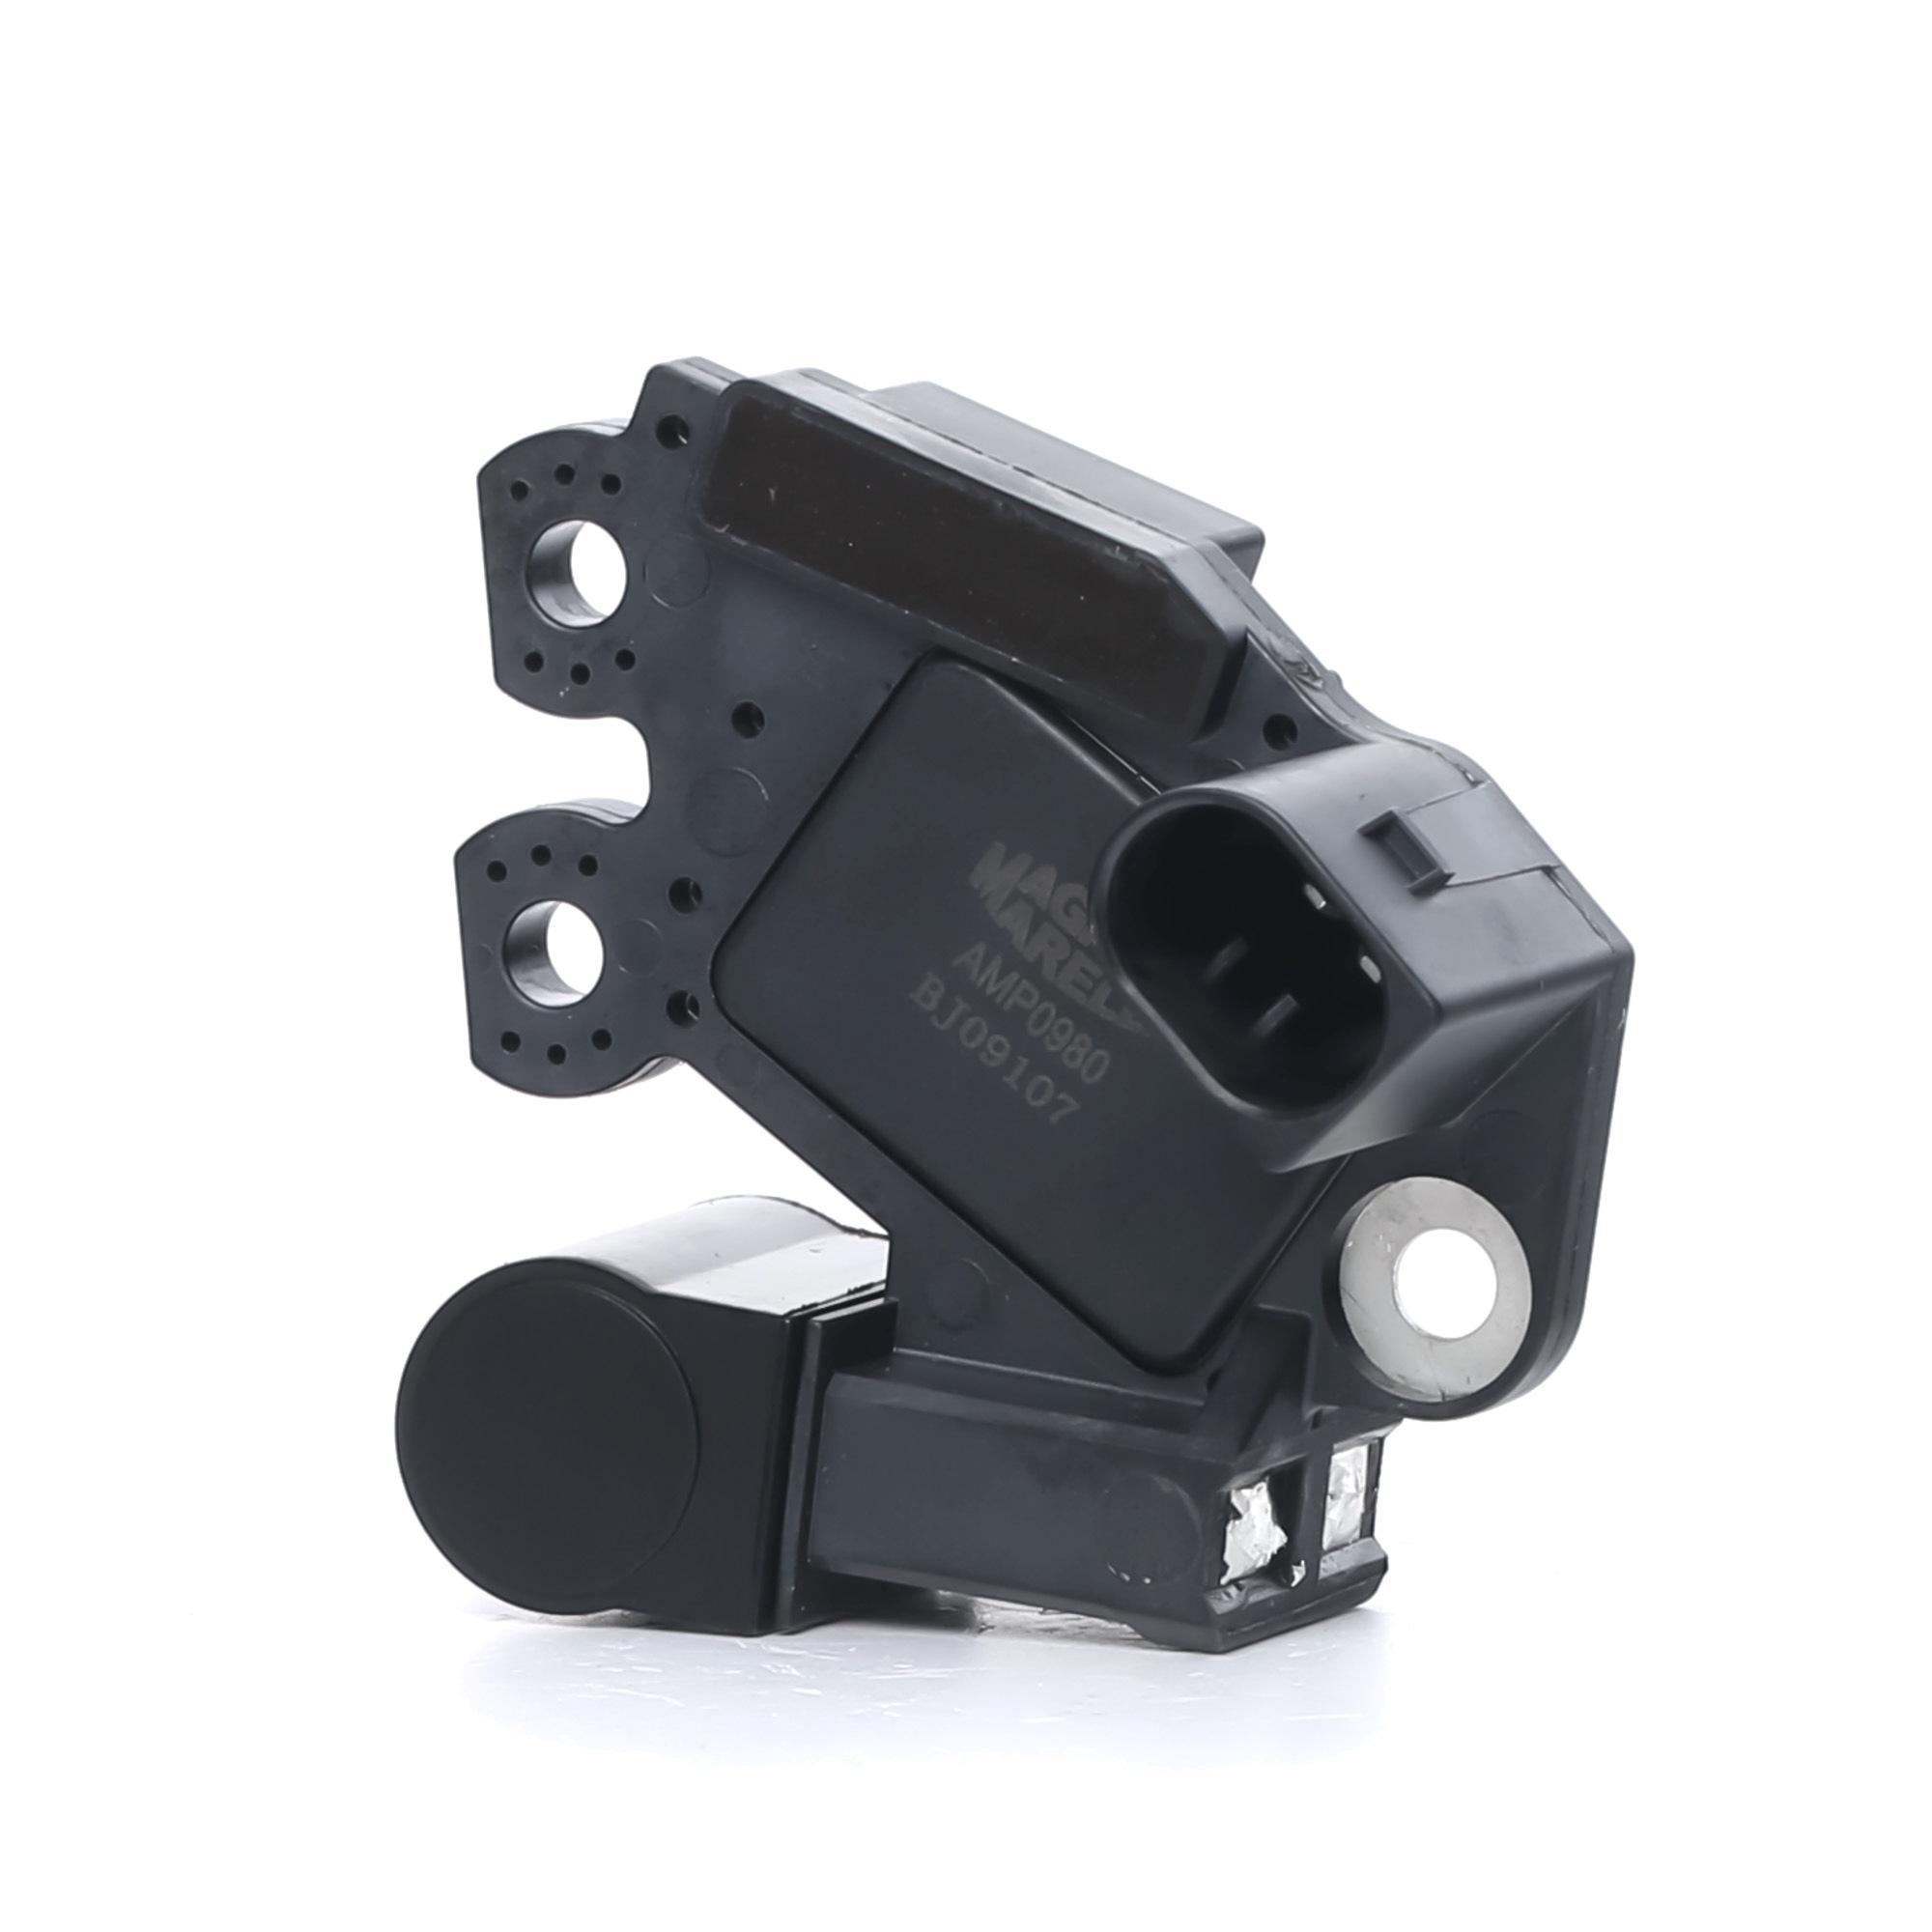 AUDI A3 2019 Lichtmaschinenregler - Original MAGNETI MARELLI 940016098000